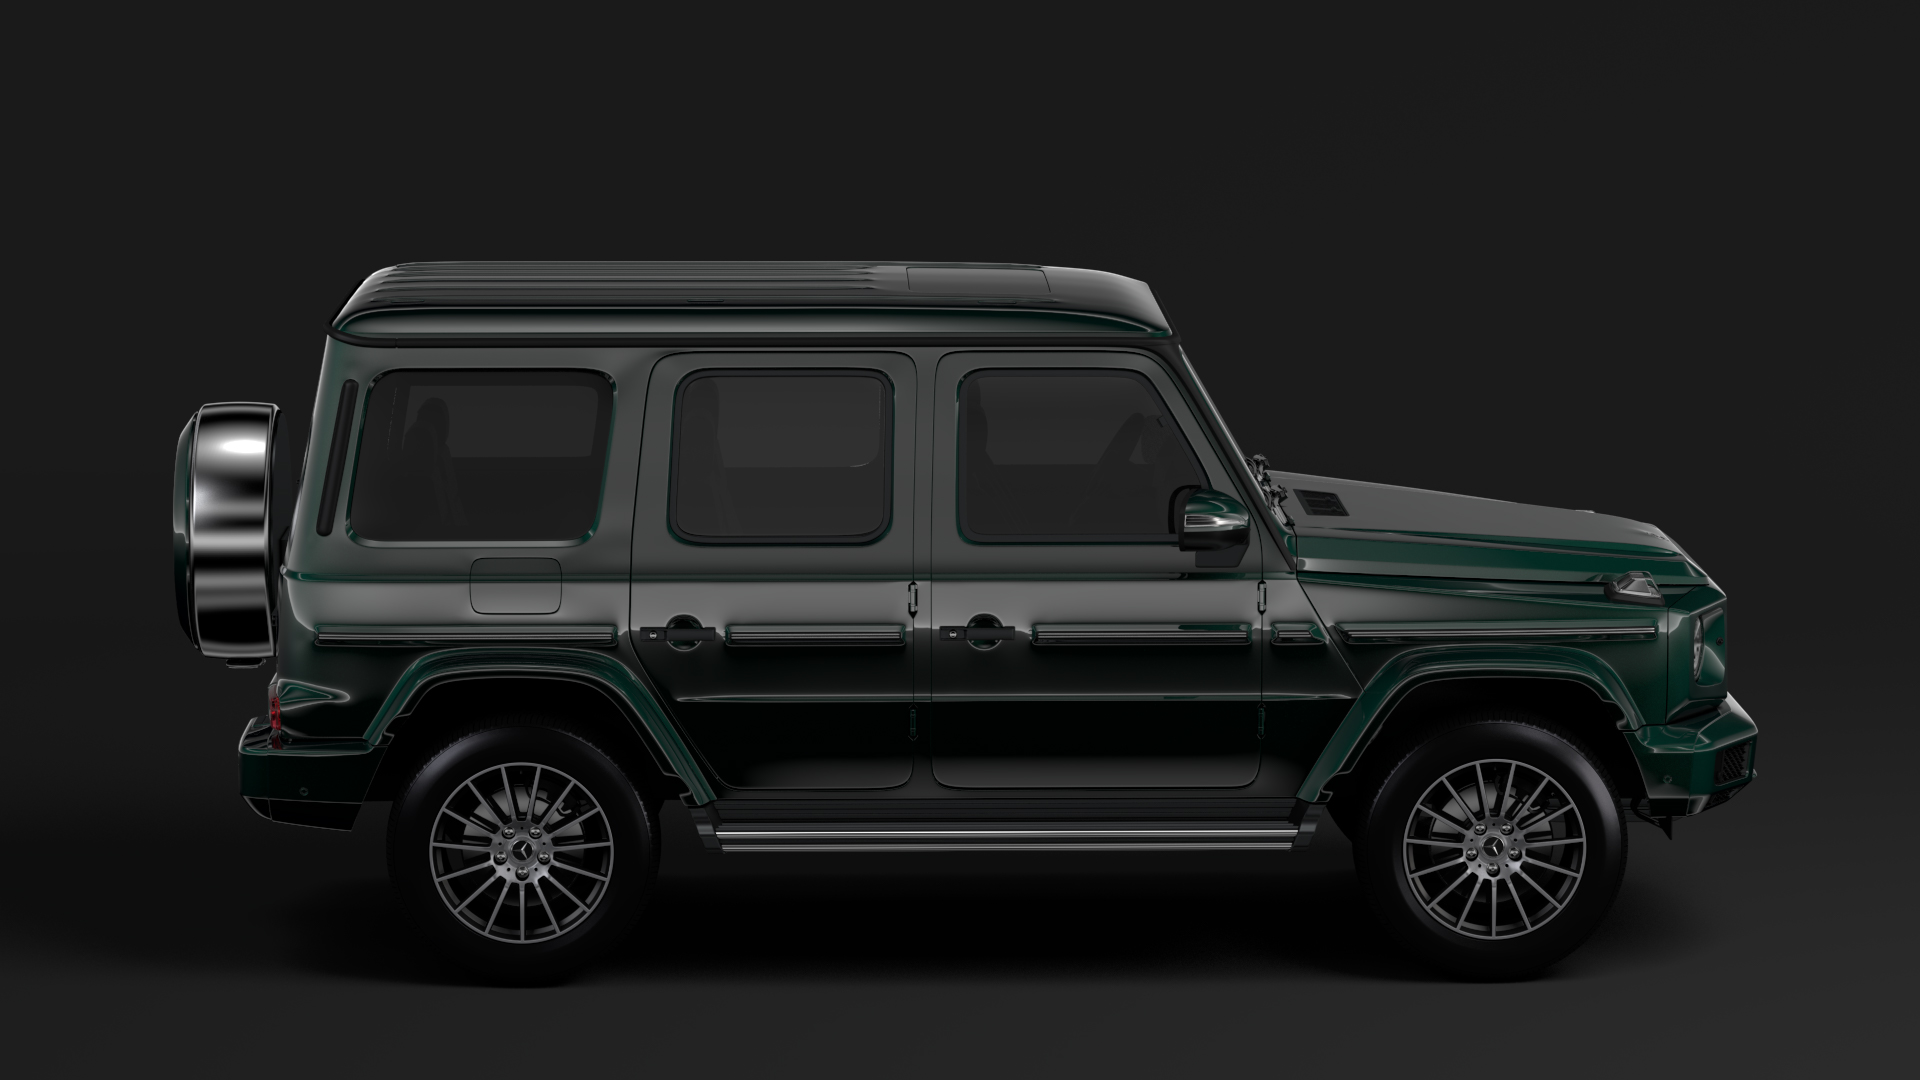 mercedes-benz g 550 (w464) 2018 3d model max fbx c4d lwo ma mb hrc xsi obj 277666